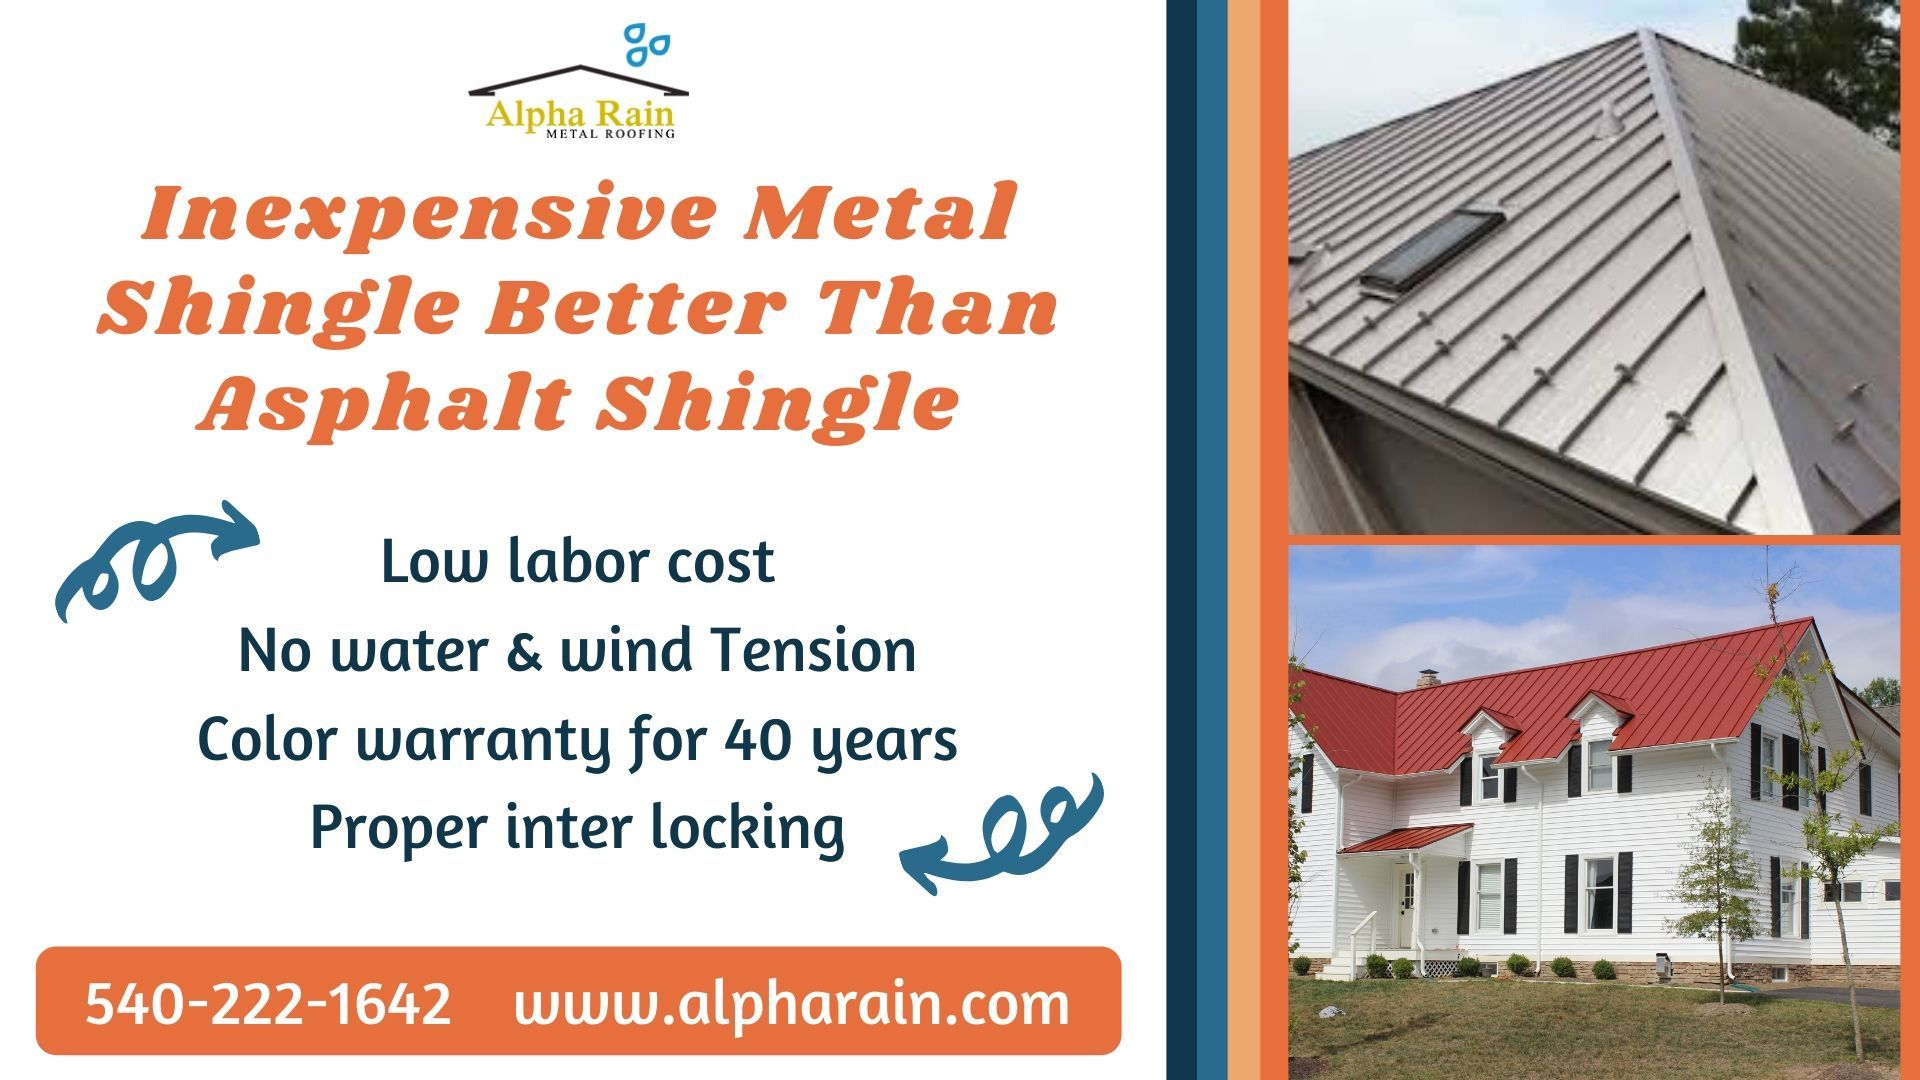 Installing Metal Shingles At Reasonable Price Alpha Rain In 2020 Metal Shingle Roof Shingling Metal Shingles